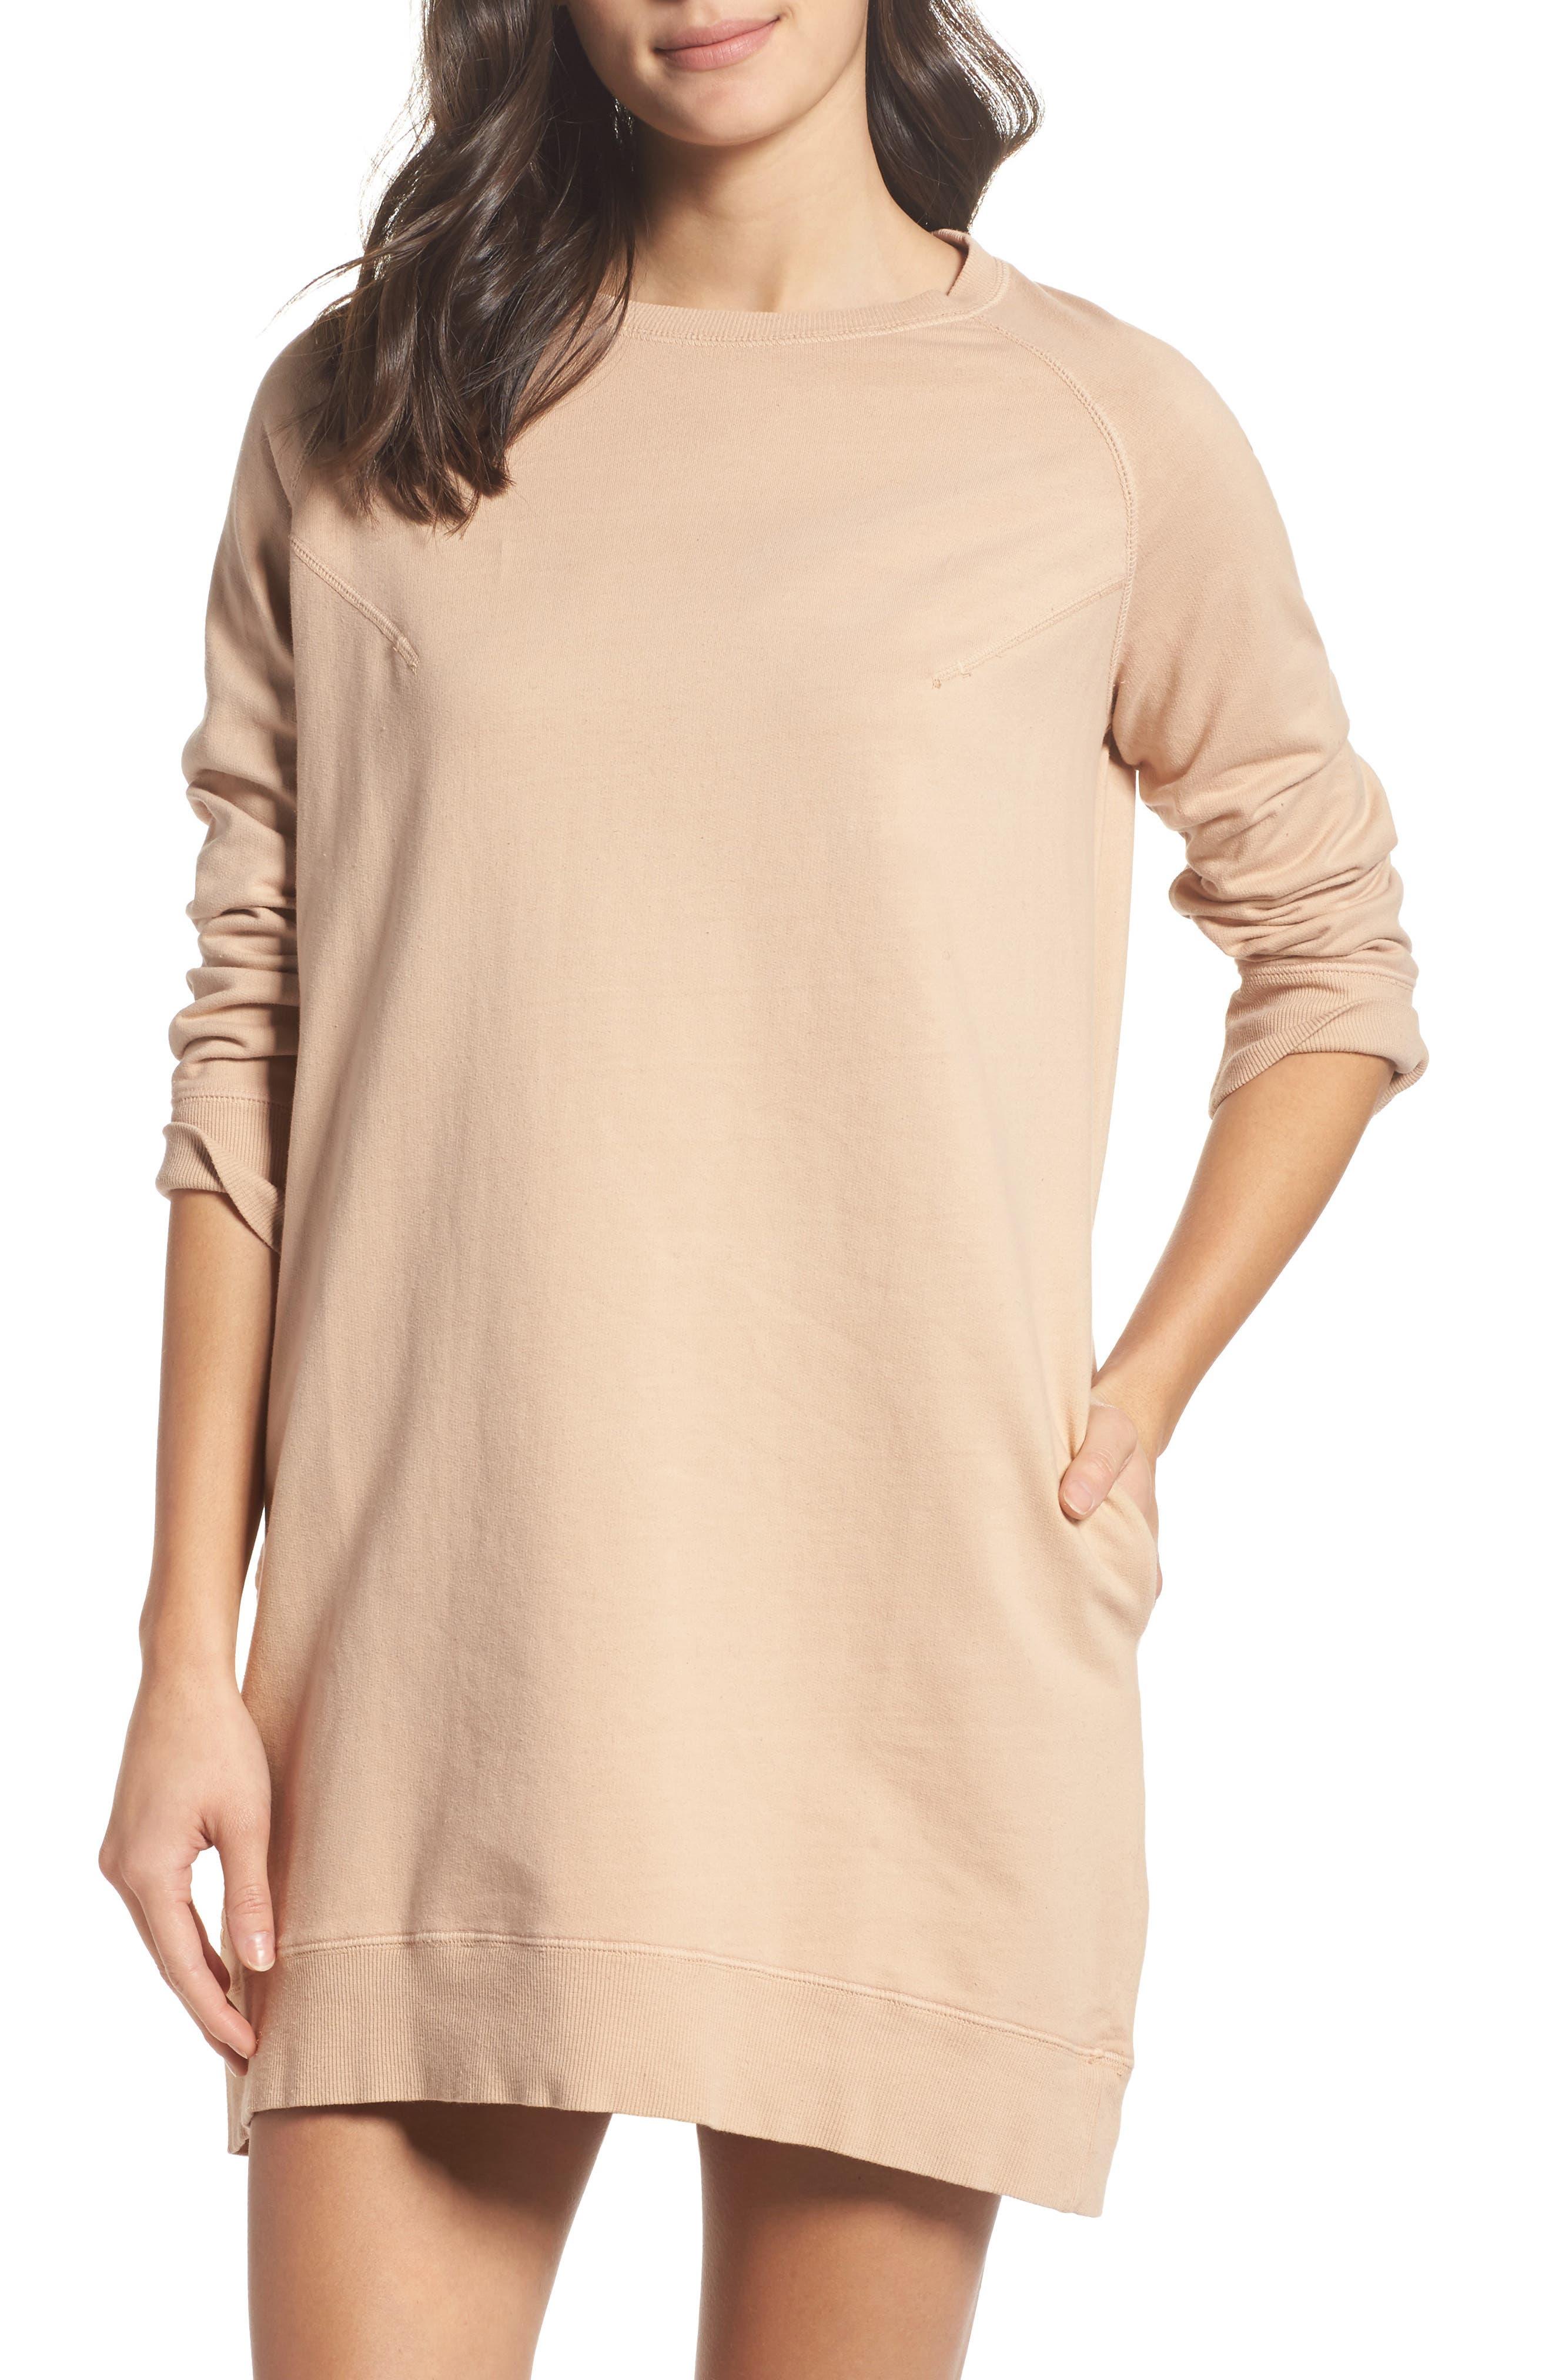 Alternate Image 1 Selected - Ragdoll Sweatshirt Dress